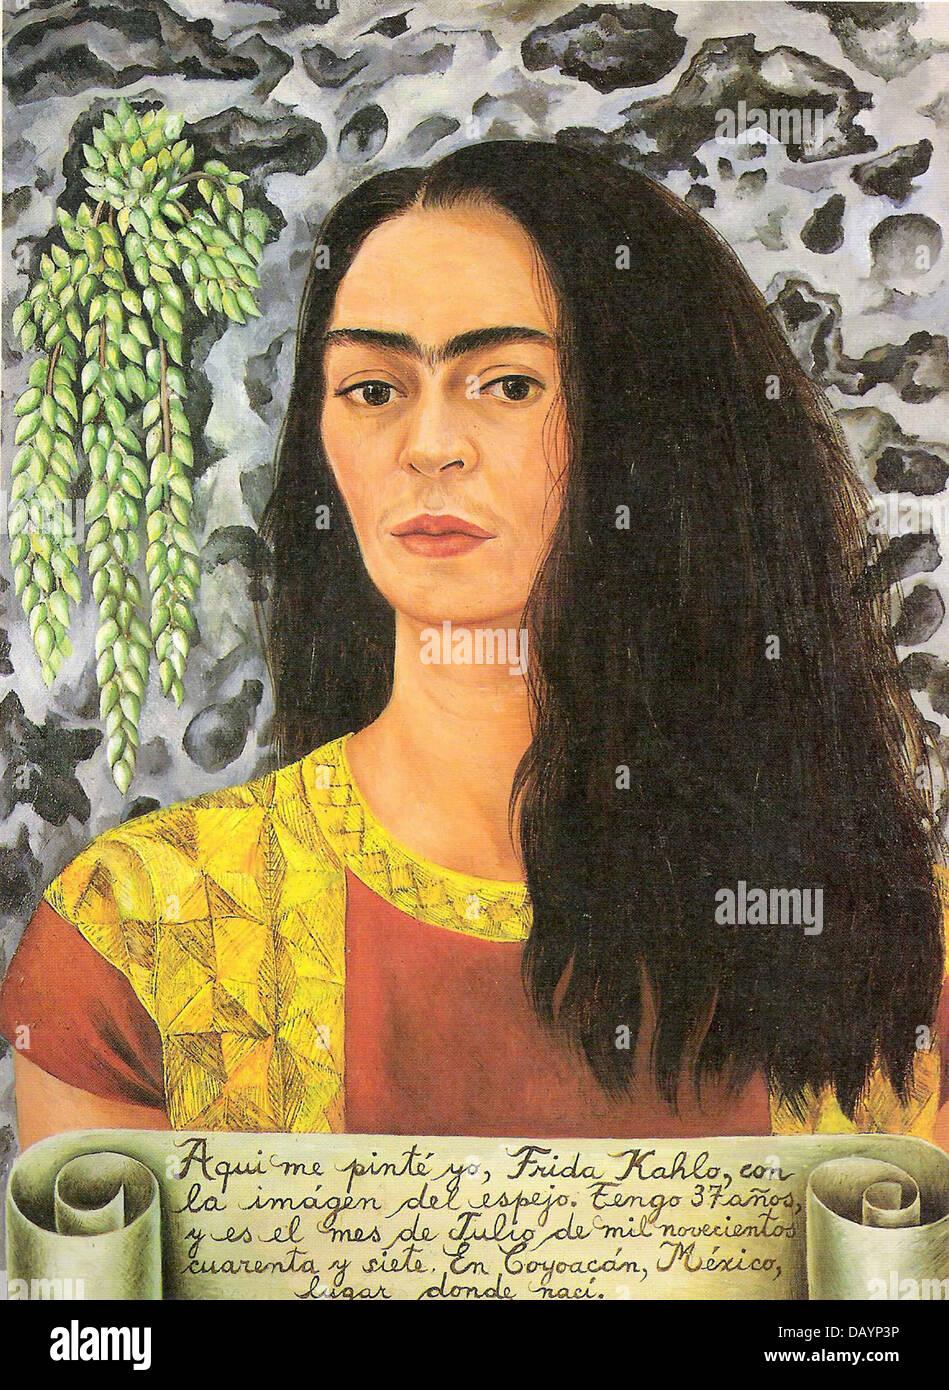 Frida Kahlo Self-portrait with inscription 1944 - Stock Image